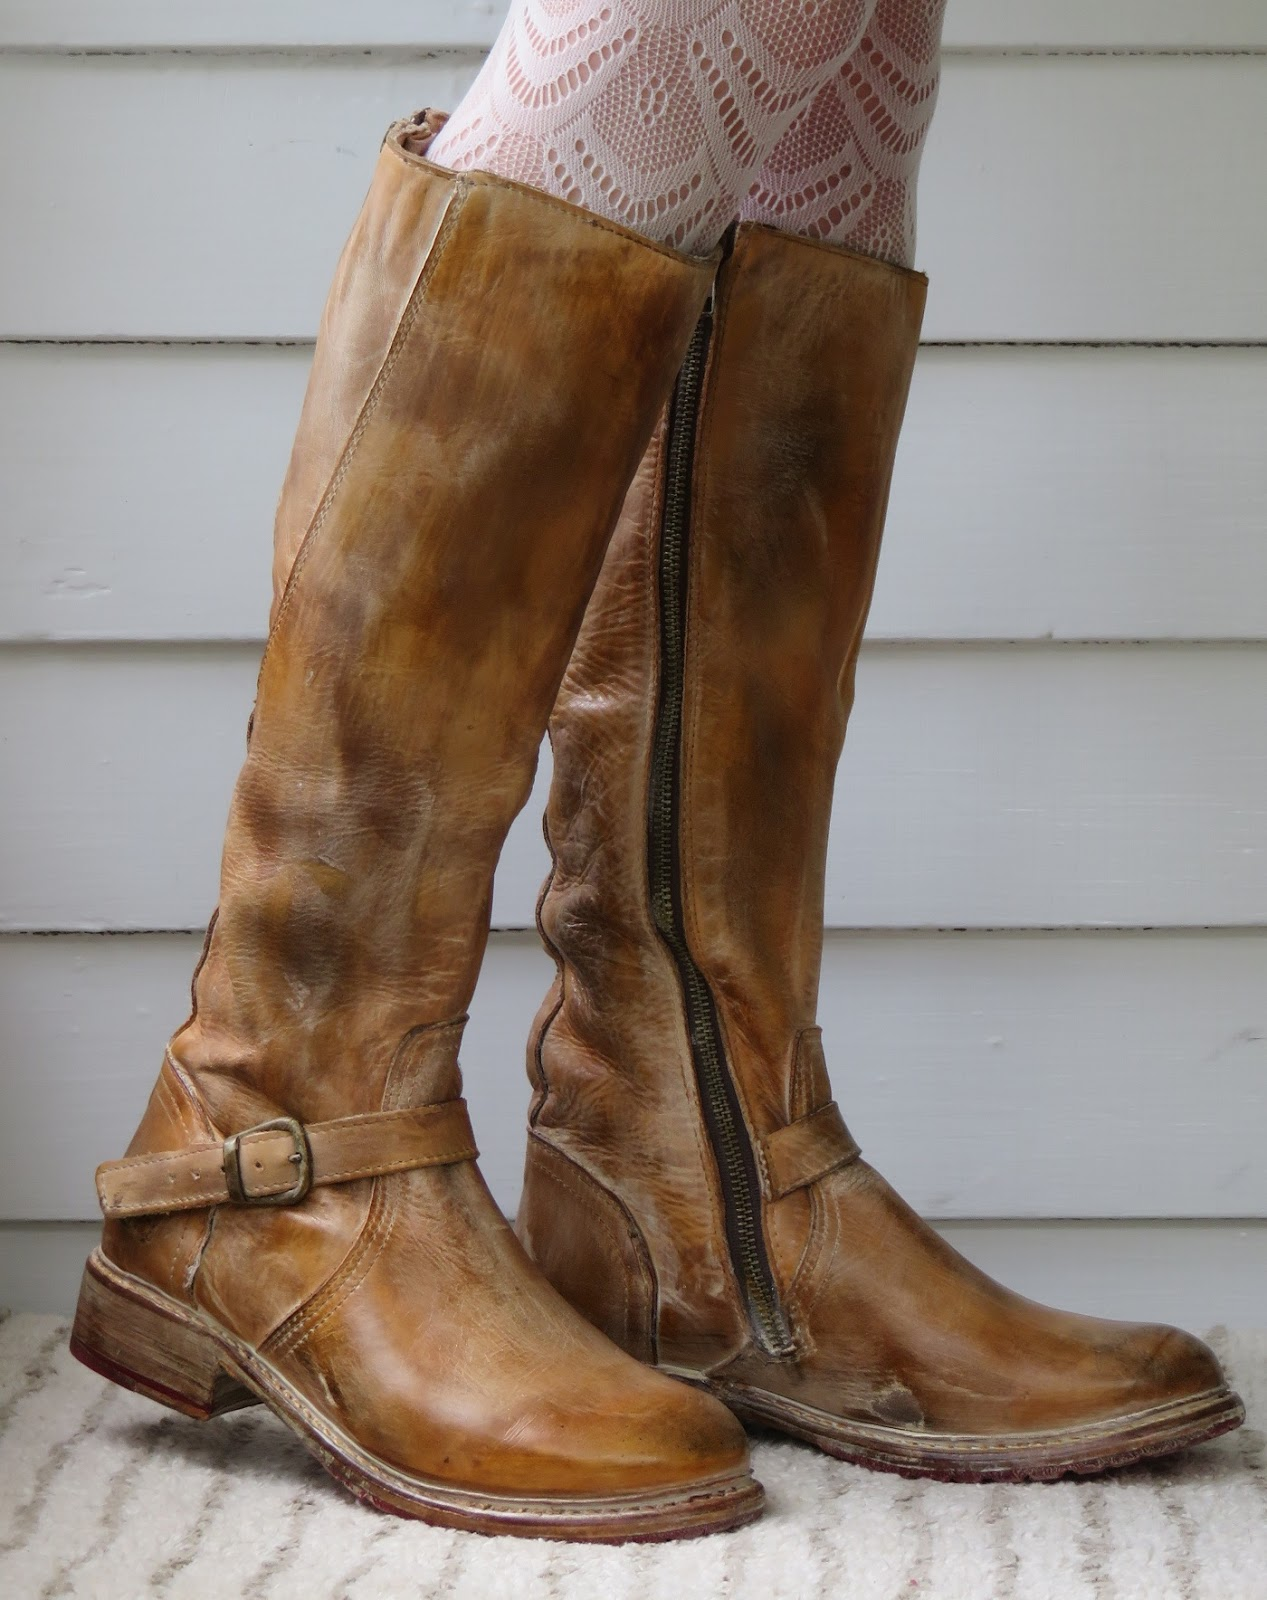 b76305de849 Howdy slim riding boots for thin calves bed stu glaye jpg 1267x1600 Small  calves